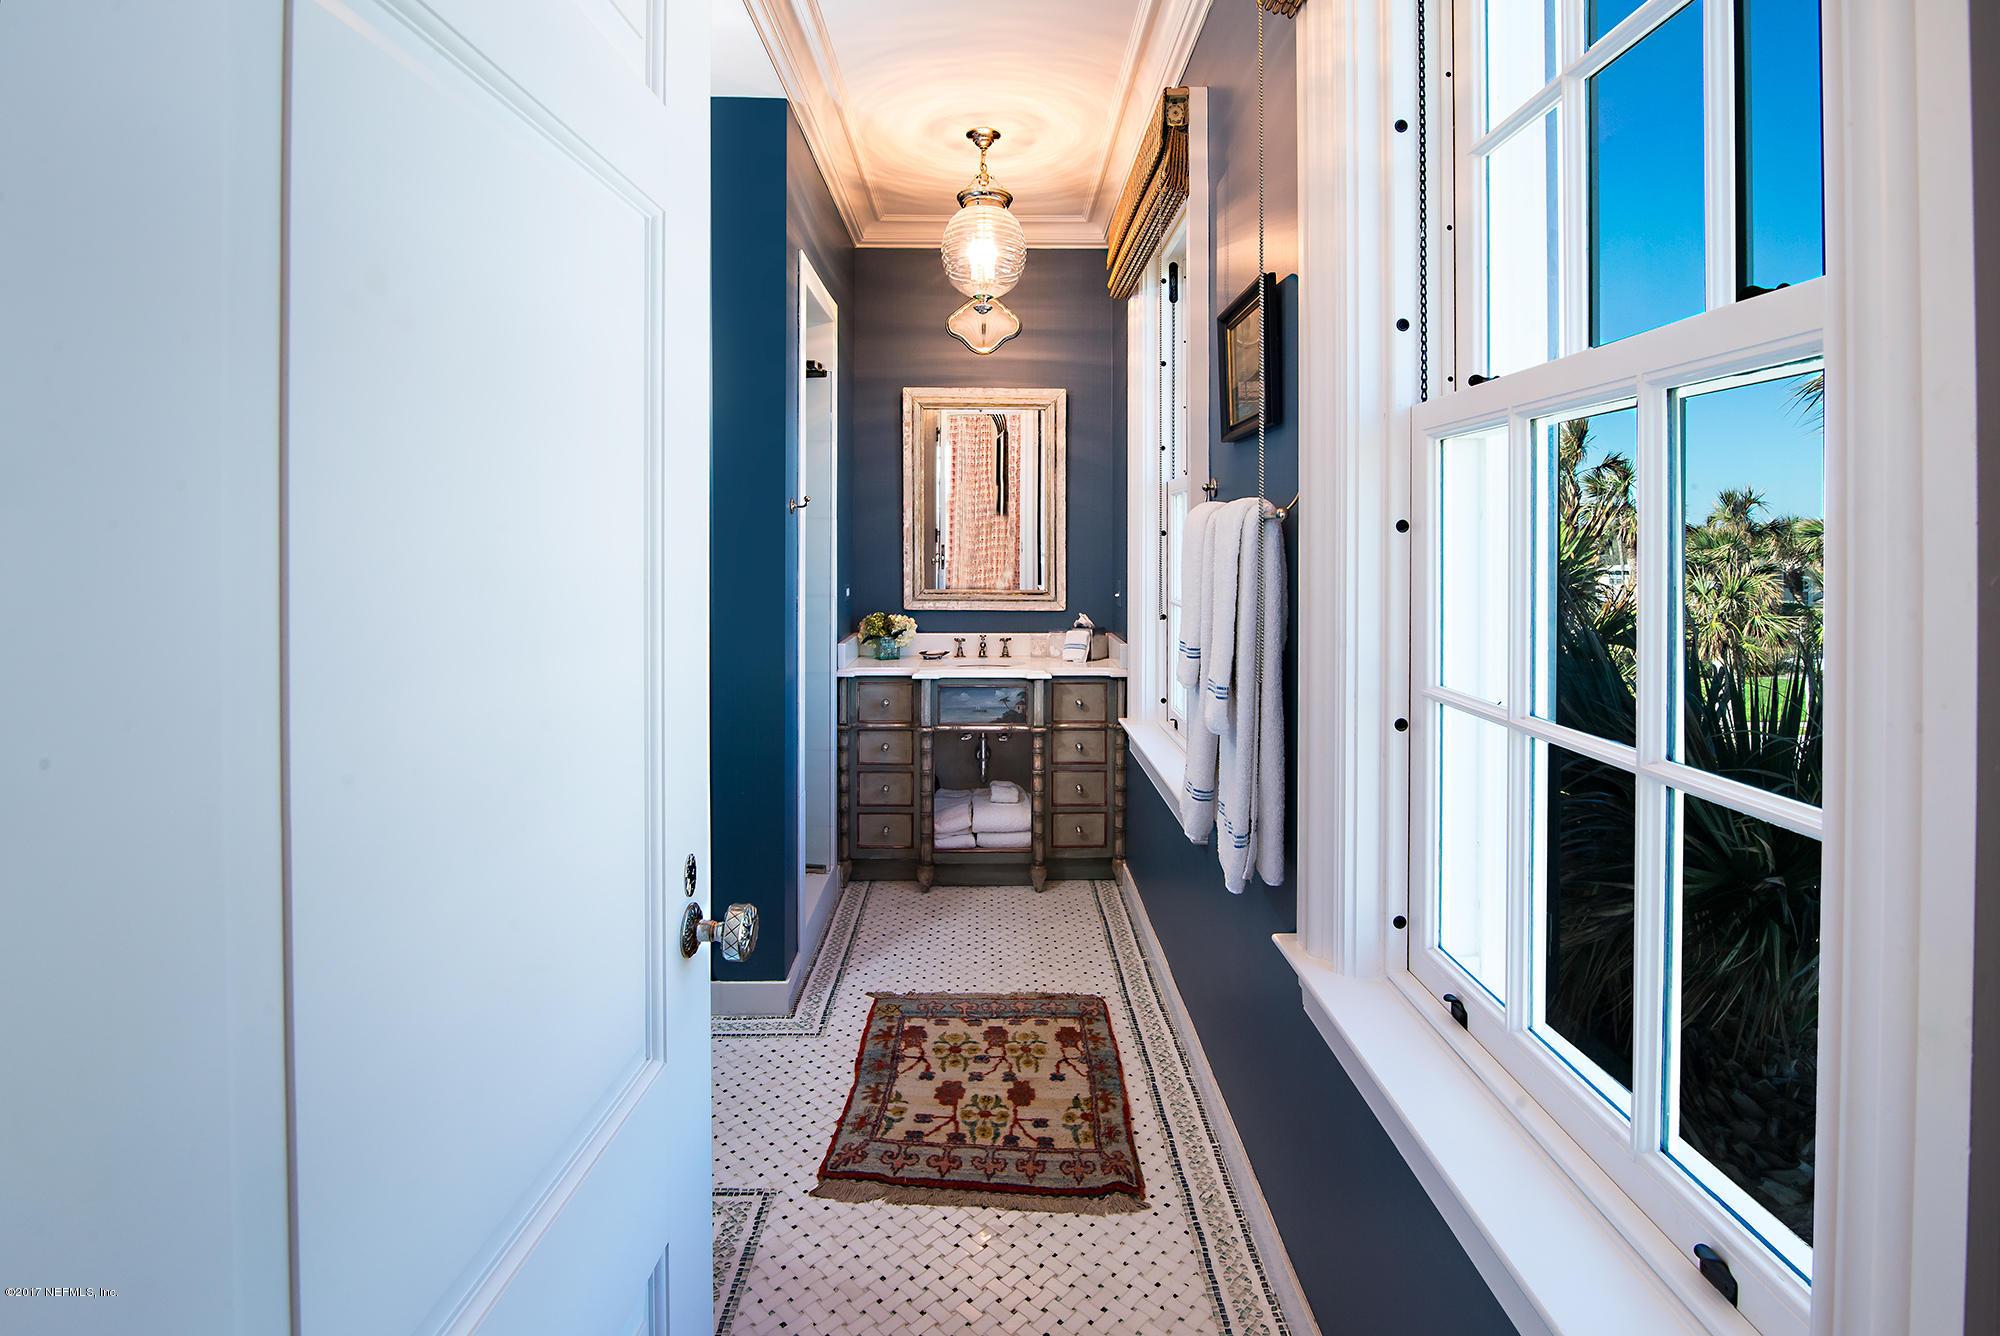 335 PONTE VEDRA, PONTE VEDRA BEACH, FLORIDA 32082, 7 Bedrooms Bedrooms, ,7 BathroomsBathrooms,Residential - single family,For sale,PONTE VEDRA,912158